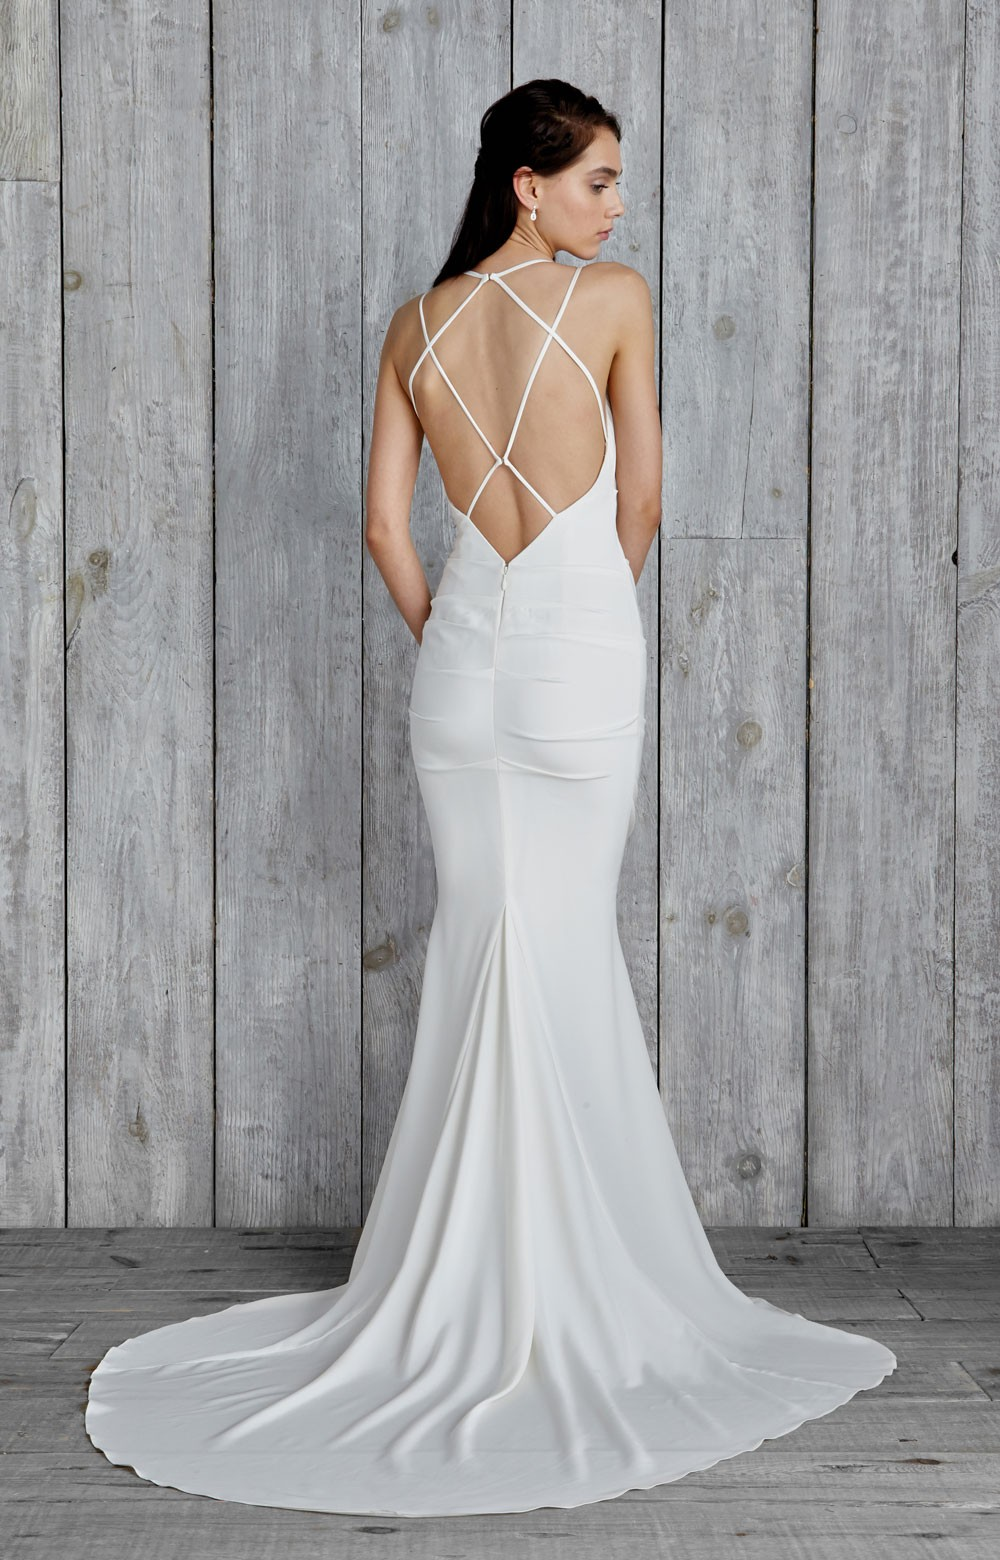 Nicole miller bridal celine bijou bridal bridal shops in nj pa nicole miller bridal celine junglespirit Choice Image